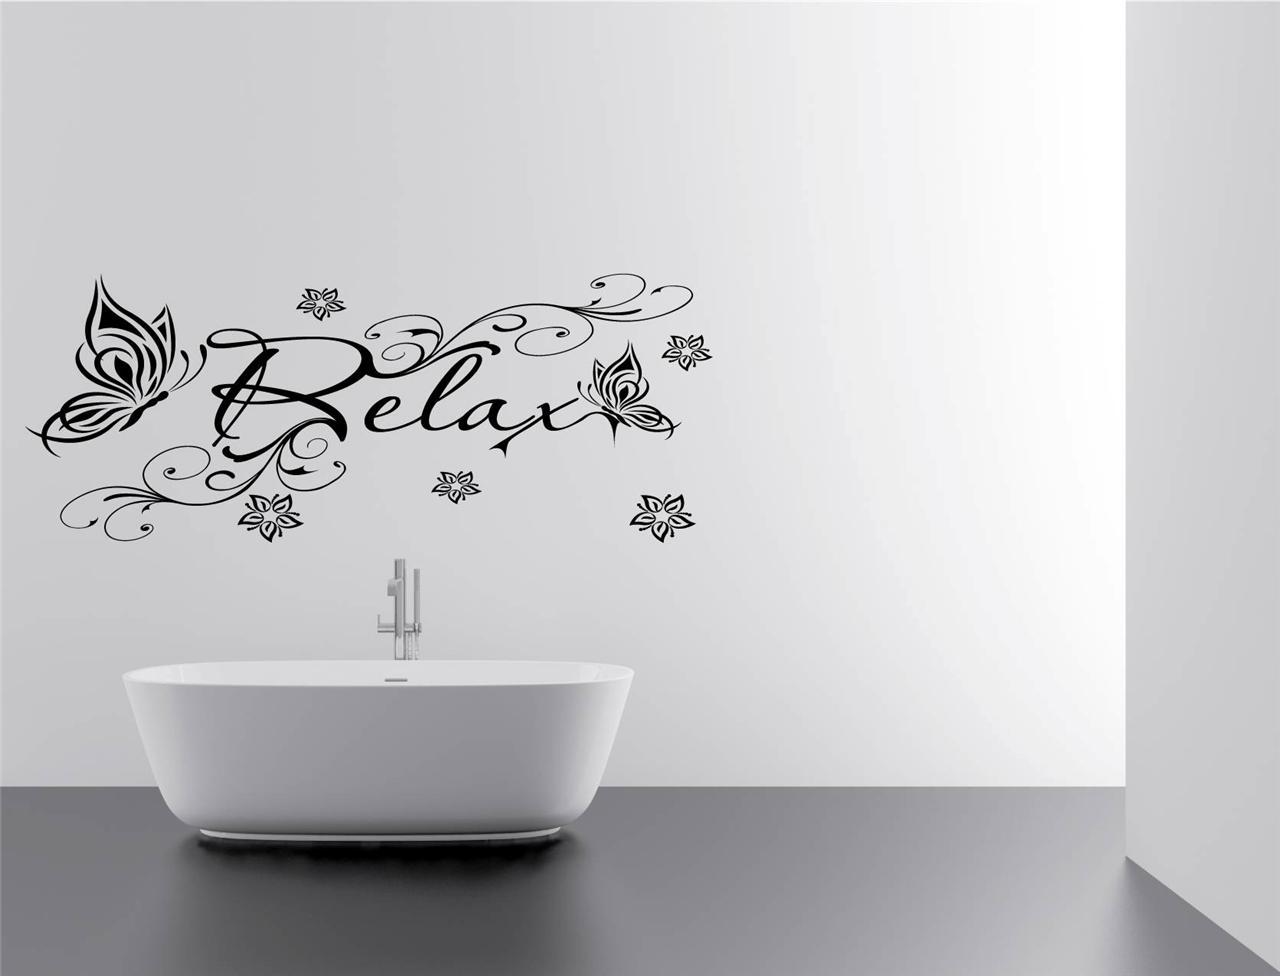 Floral relax bathroom vinyl wall art decal sticker f13 for Bathroom vinyl decor